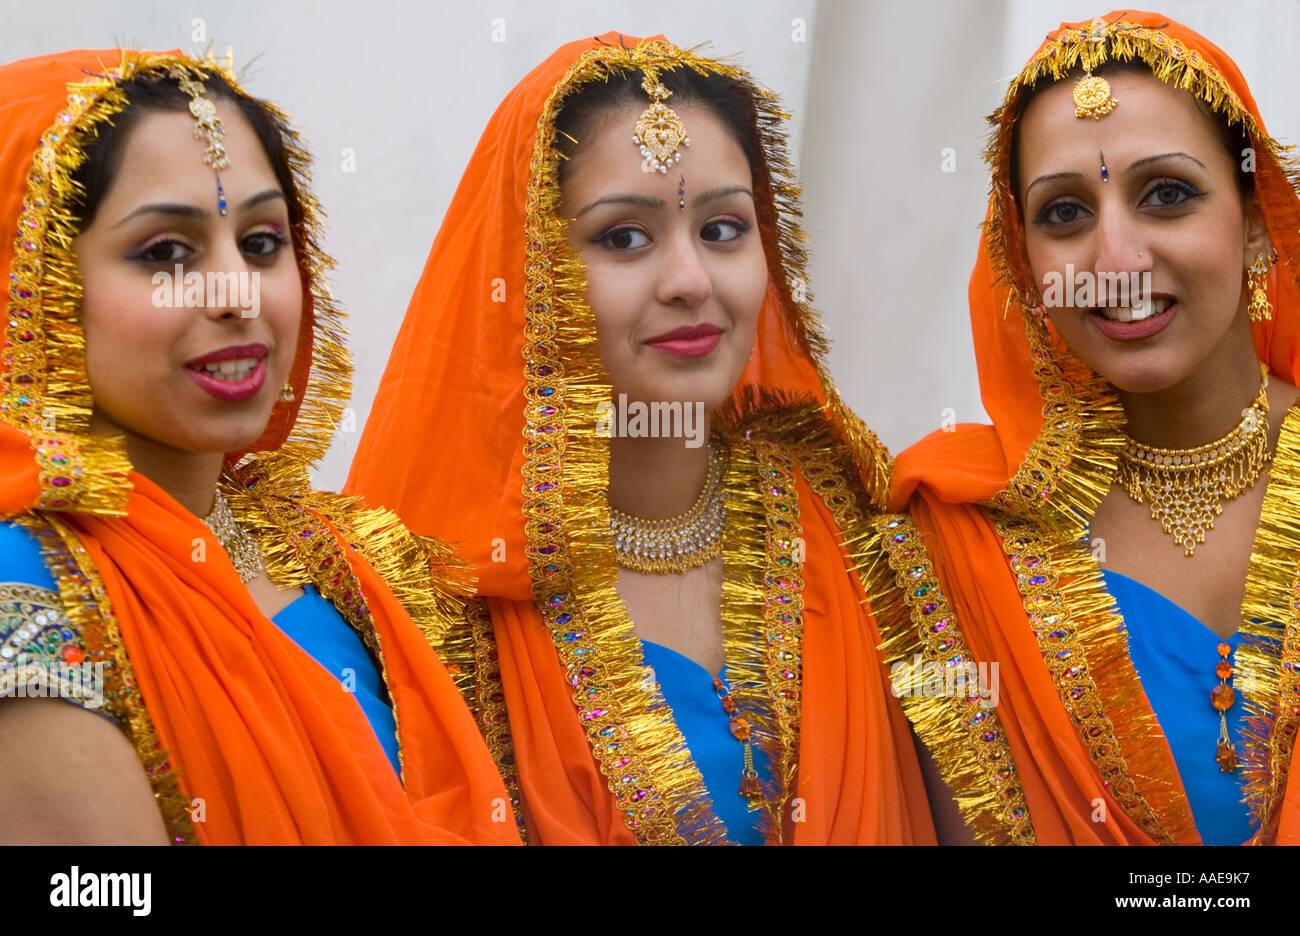 image Sikh girl in london part 2